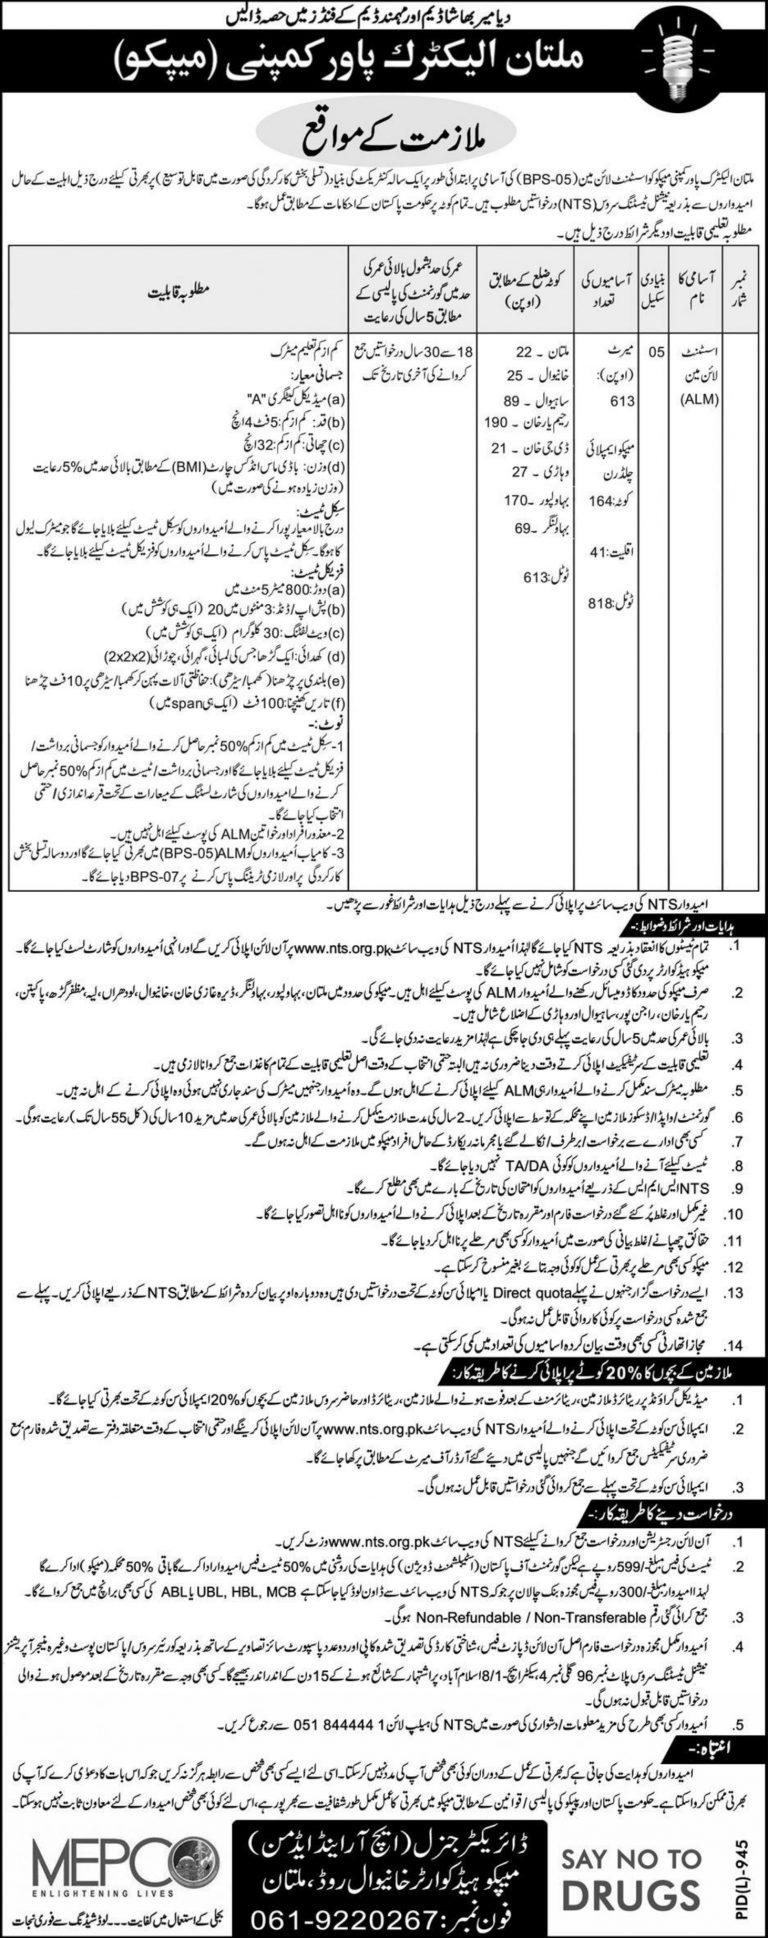 Multan Electric Power Company MEPCO Wapda Jobs 2019 NTS for Assistant Lineman ALM